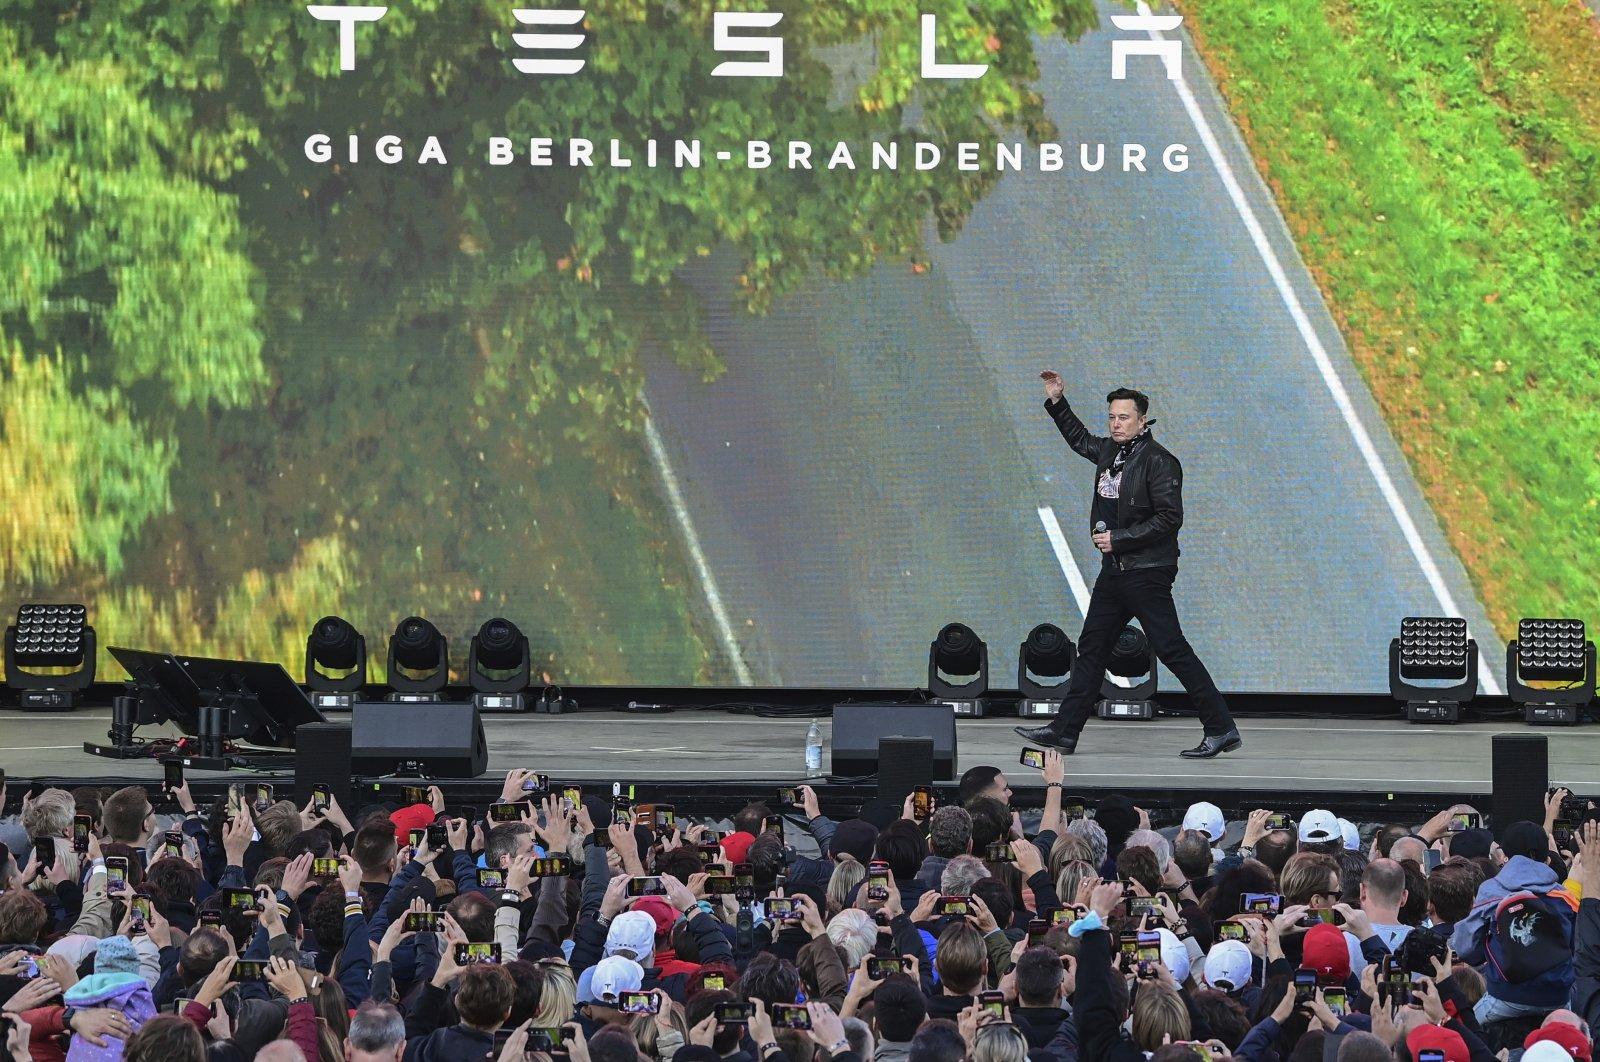 Elon Musk, Tesla CEO, arrives at an open house at the Tesla Gigafactory in Gruenheide, east of Berlin, Germany, Oct. 9, 2021. (dpa via AP)